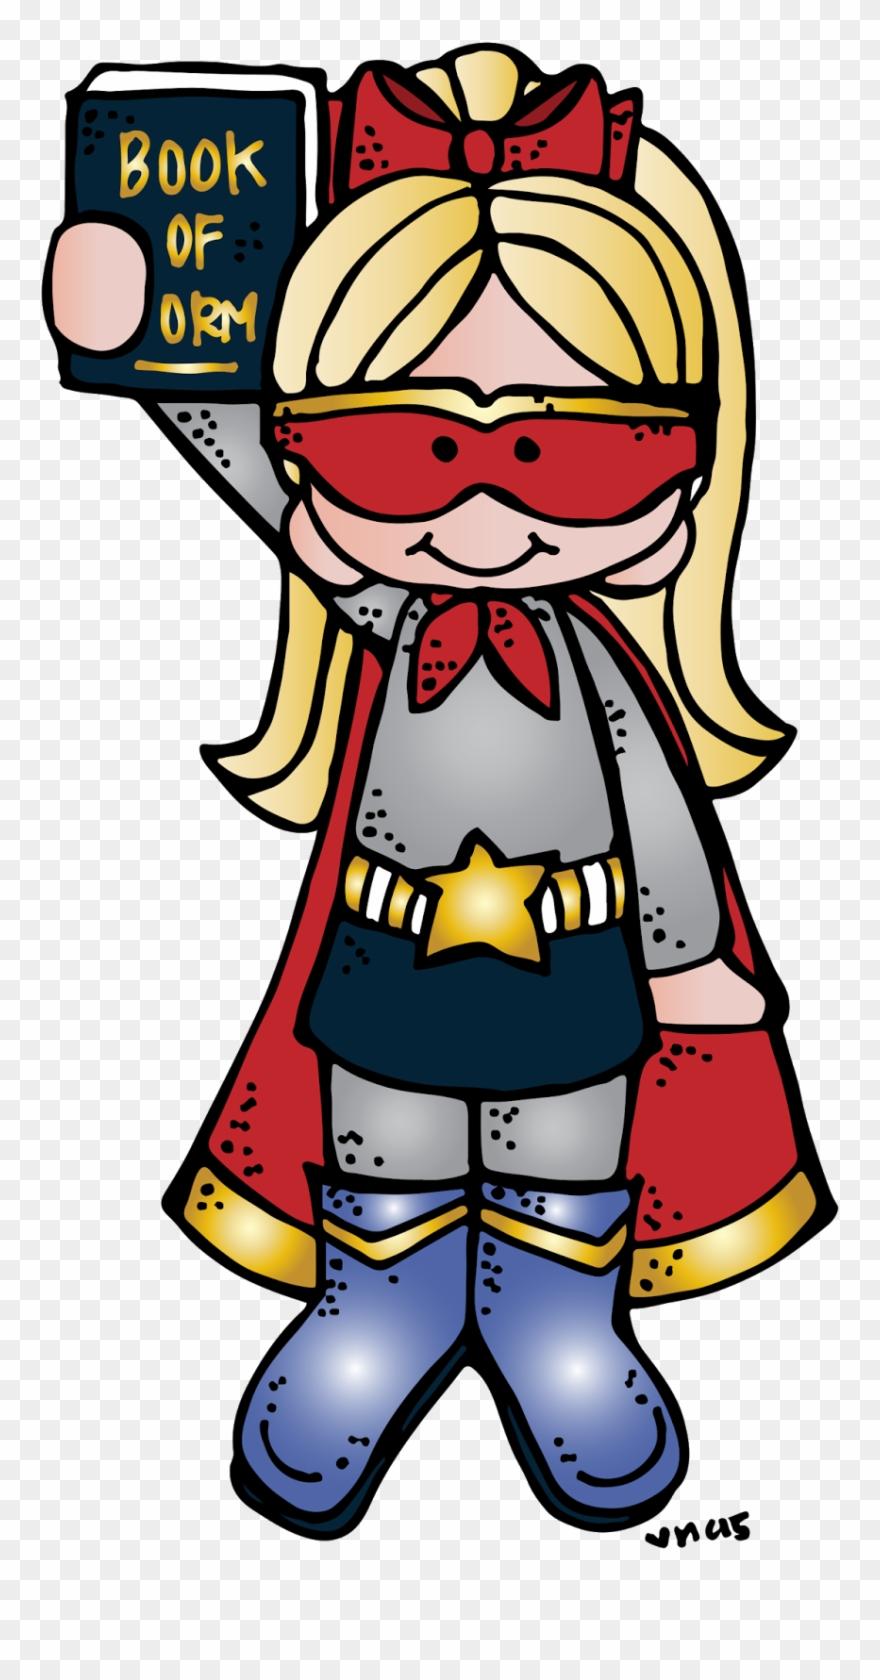 Hero clipart melonheadz. Lds illustrating theme superhero